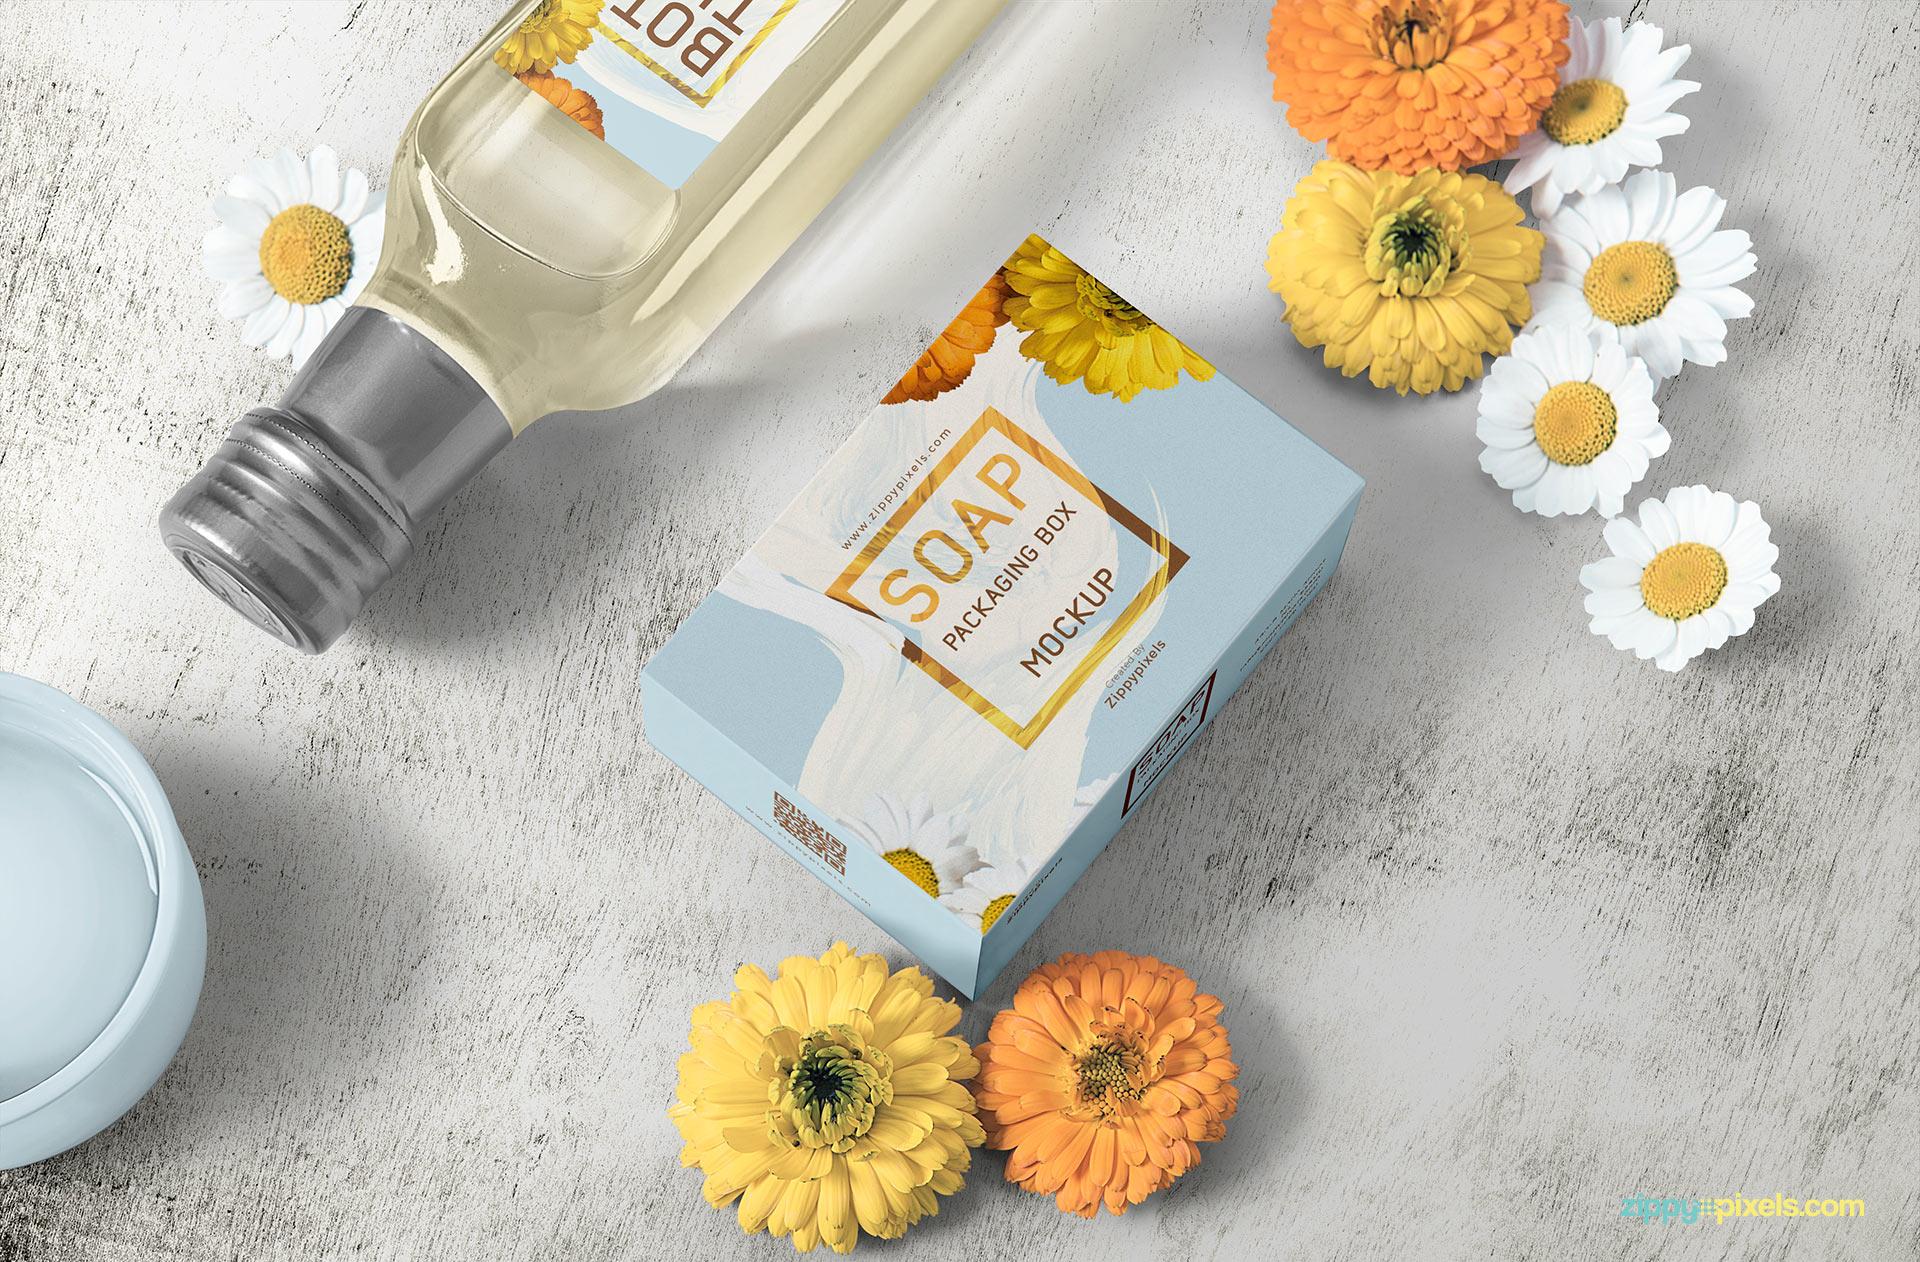 Gorgeous soap packaging box mockup scene.